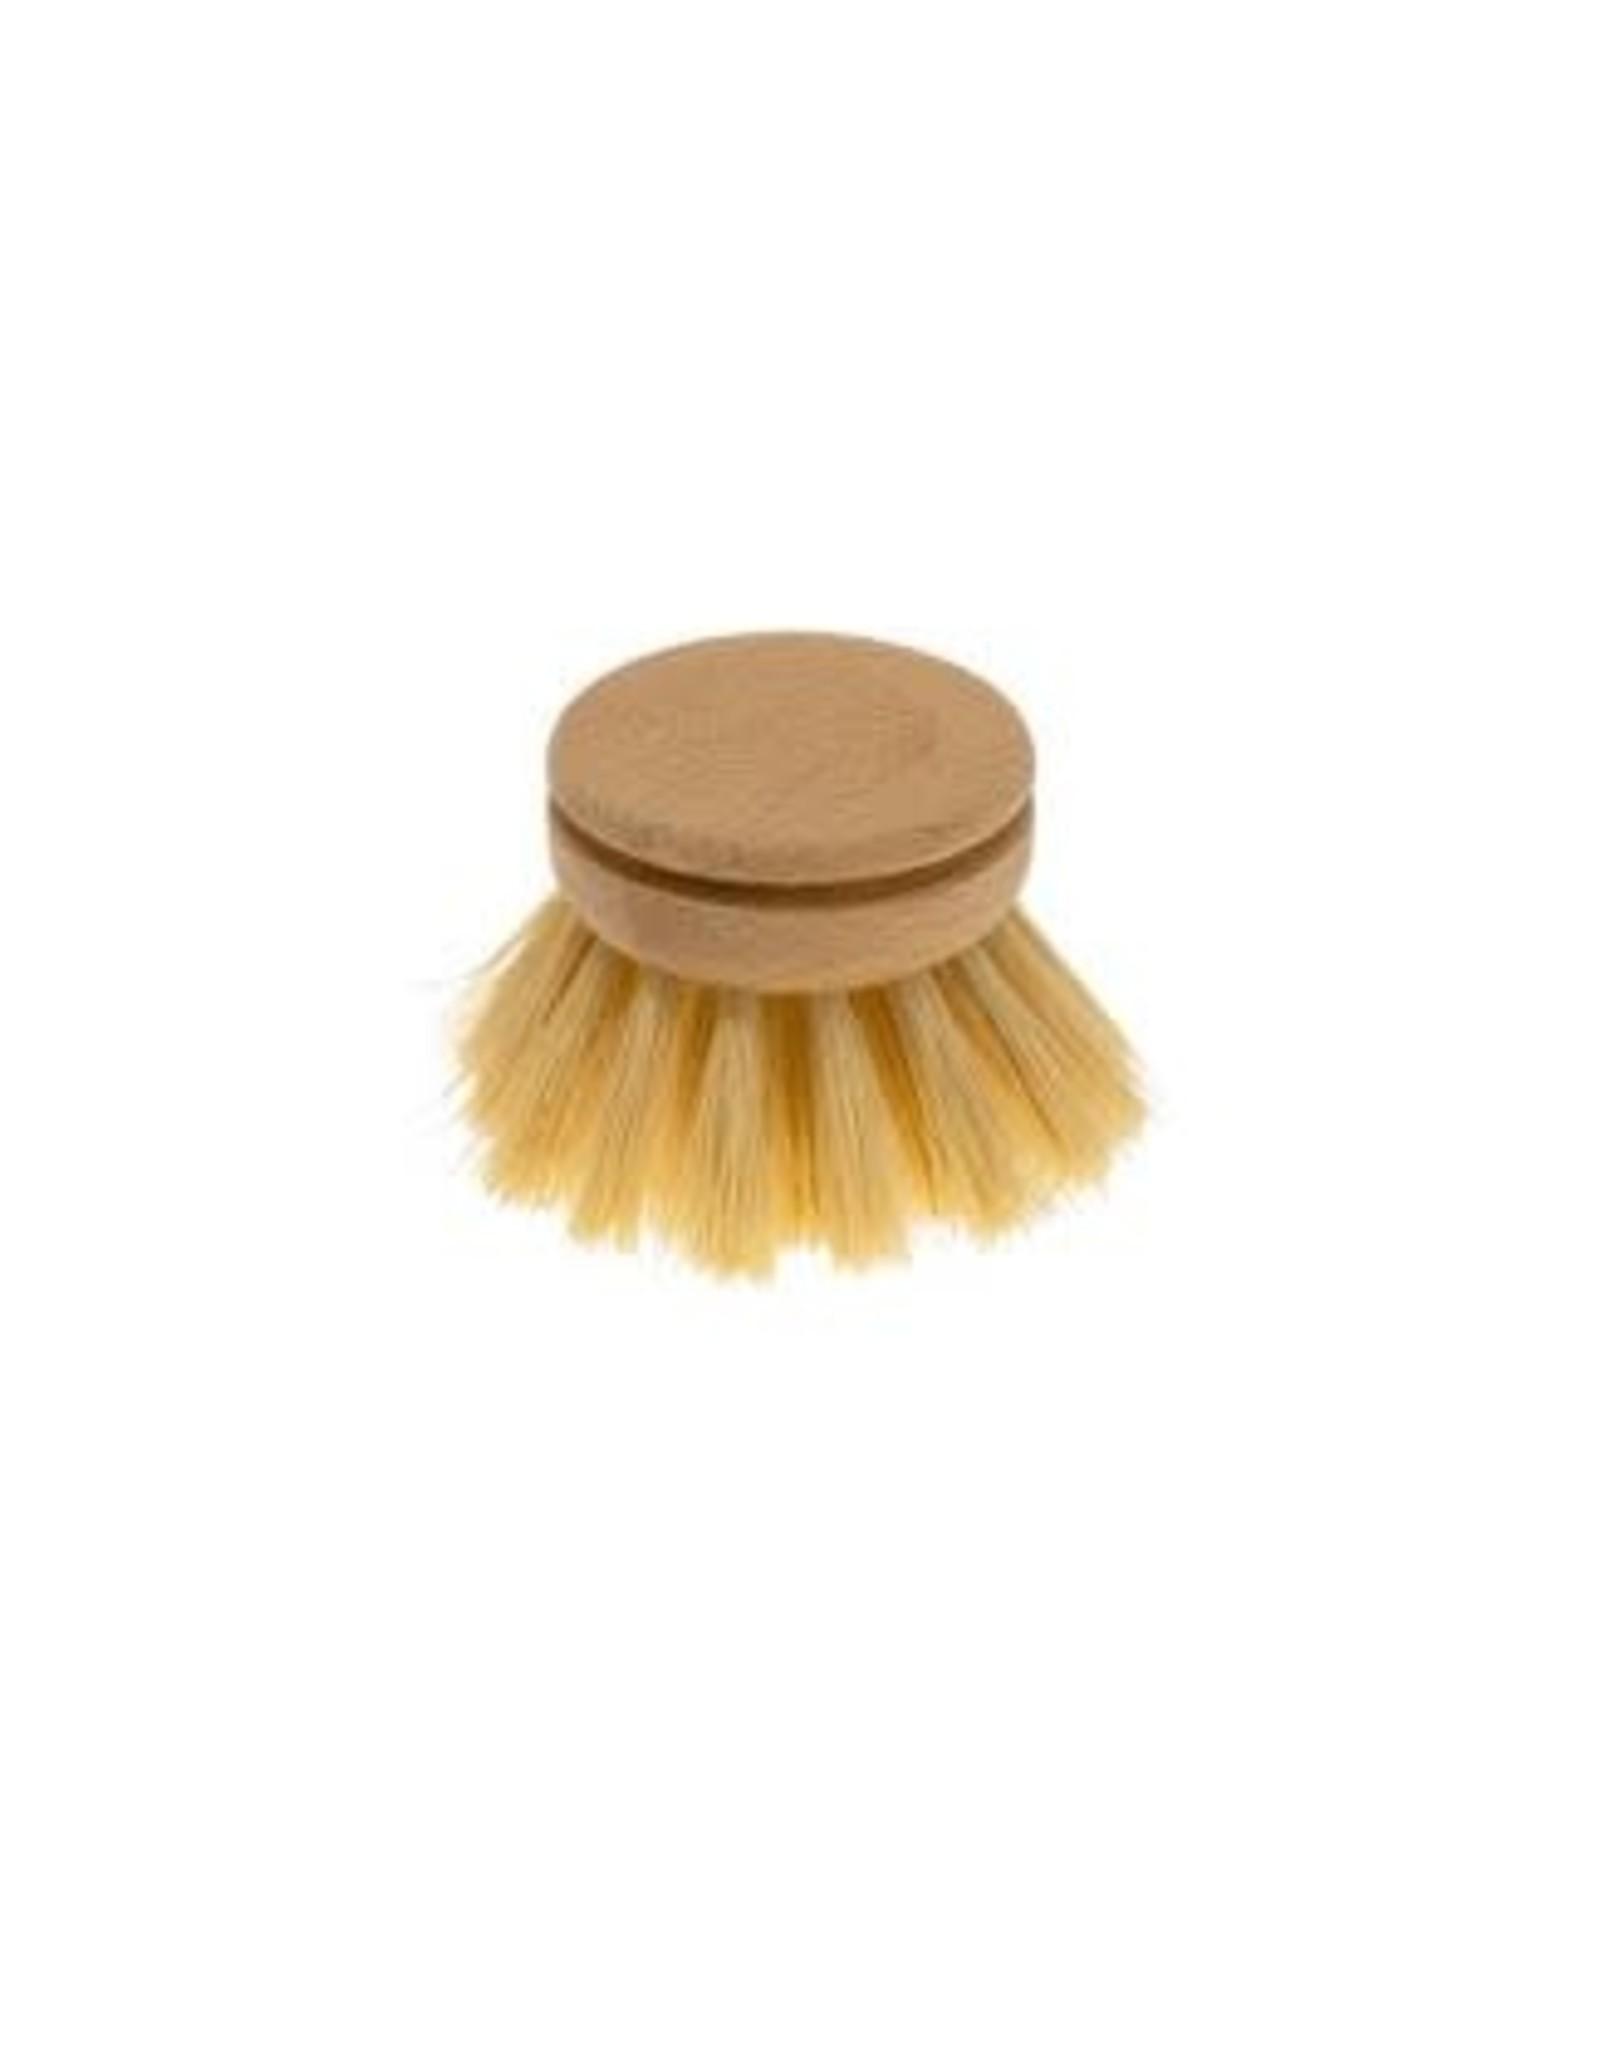 Dishbrush Everyday Refill - Tampico Fibre